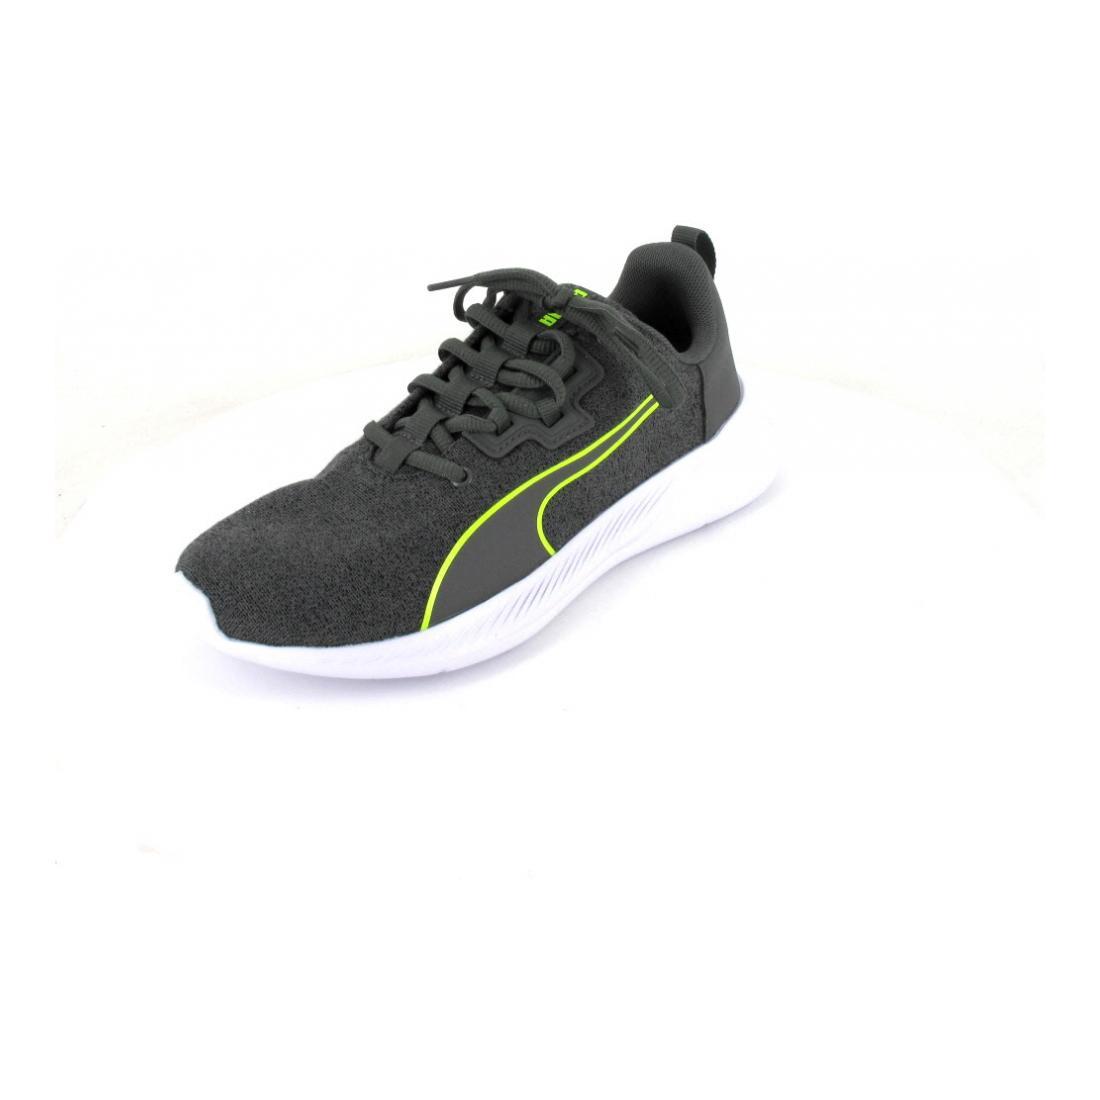 Puma Sneaker Flyler Runner